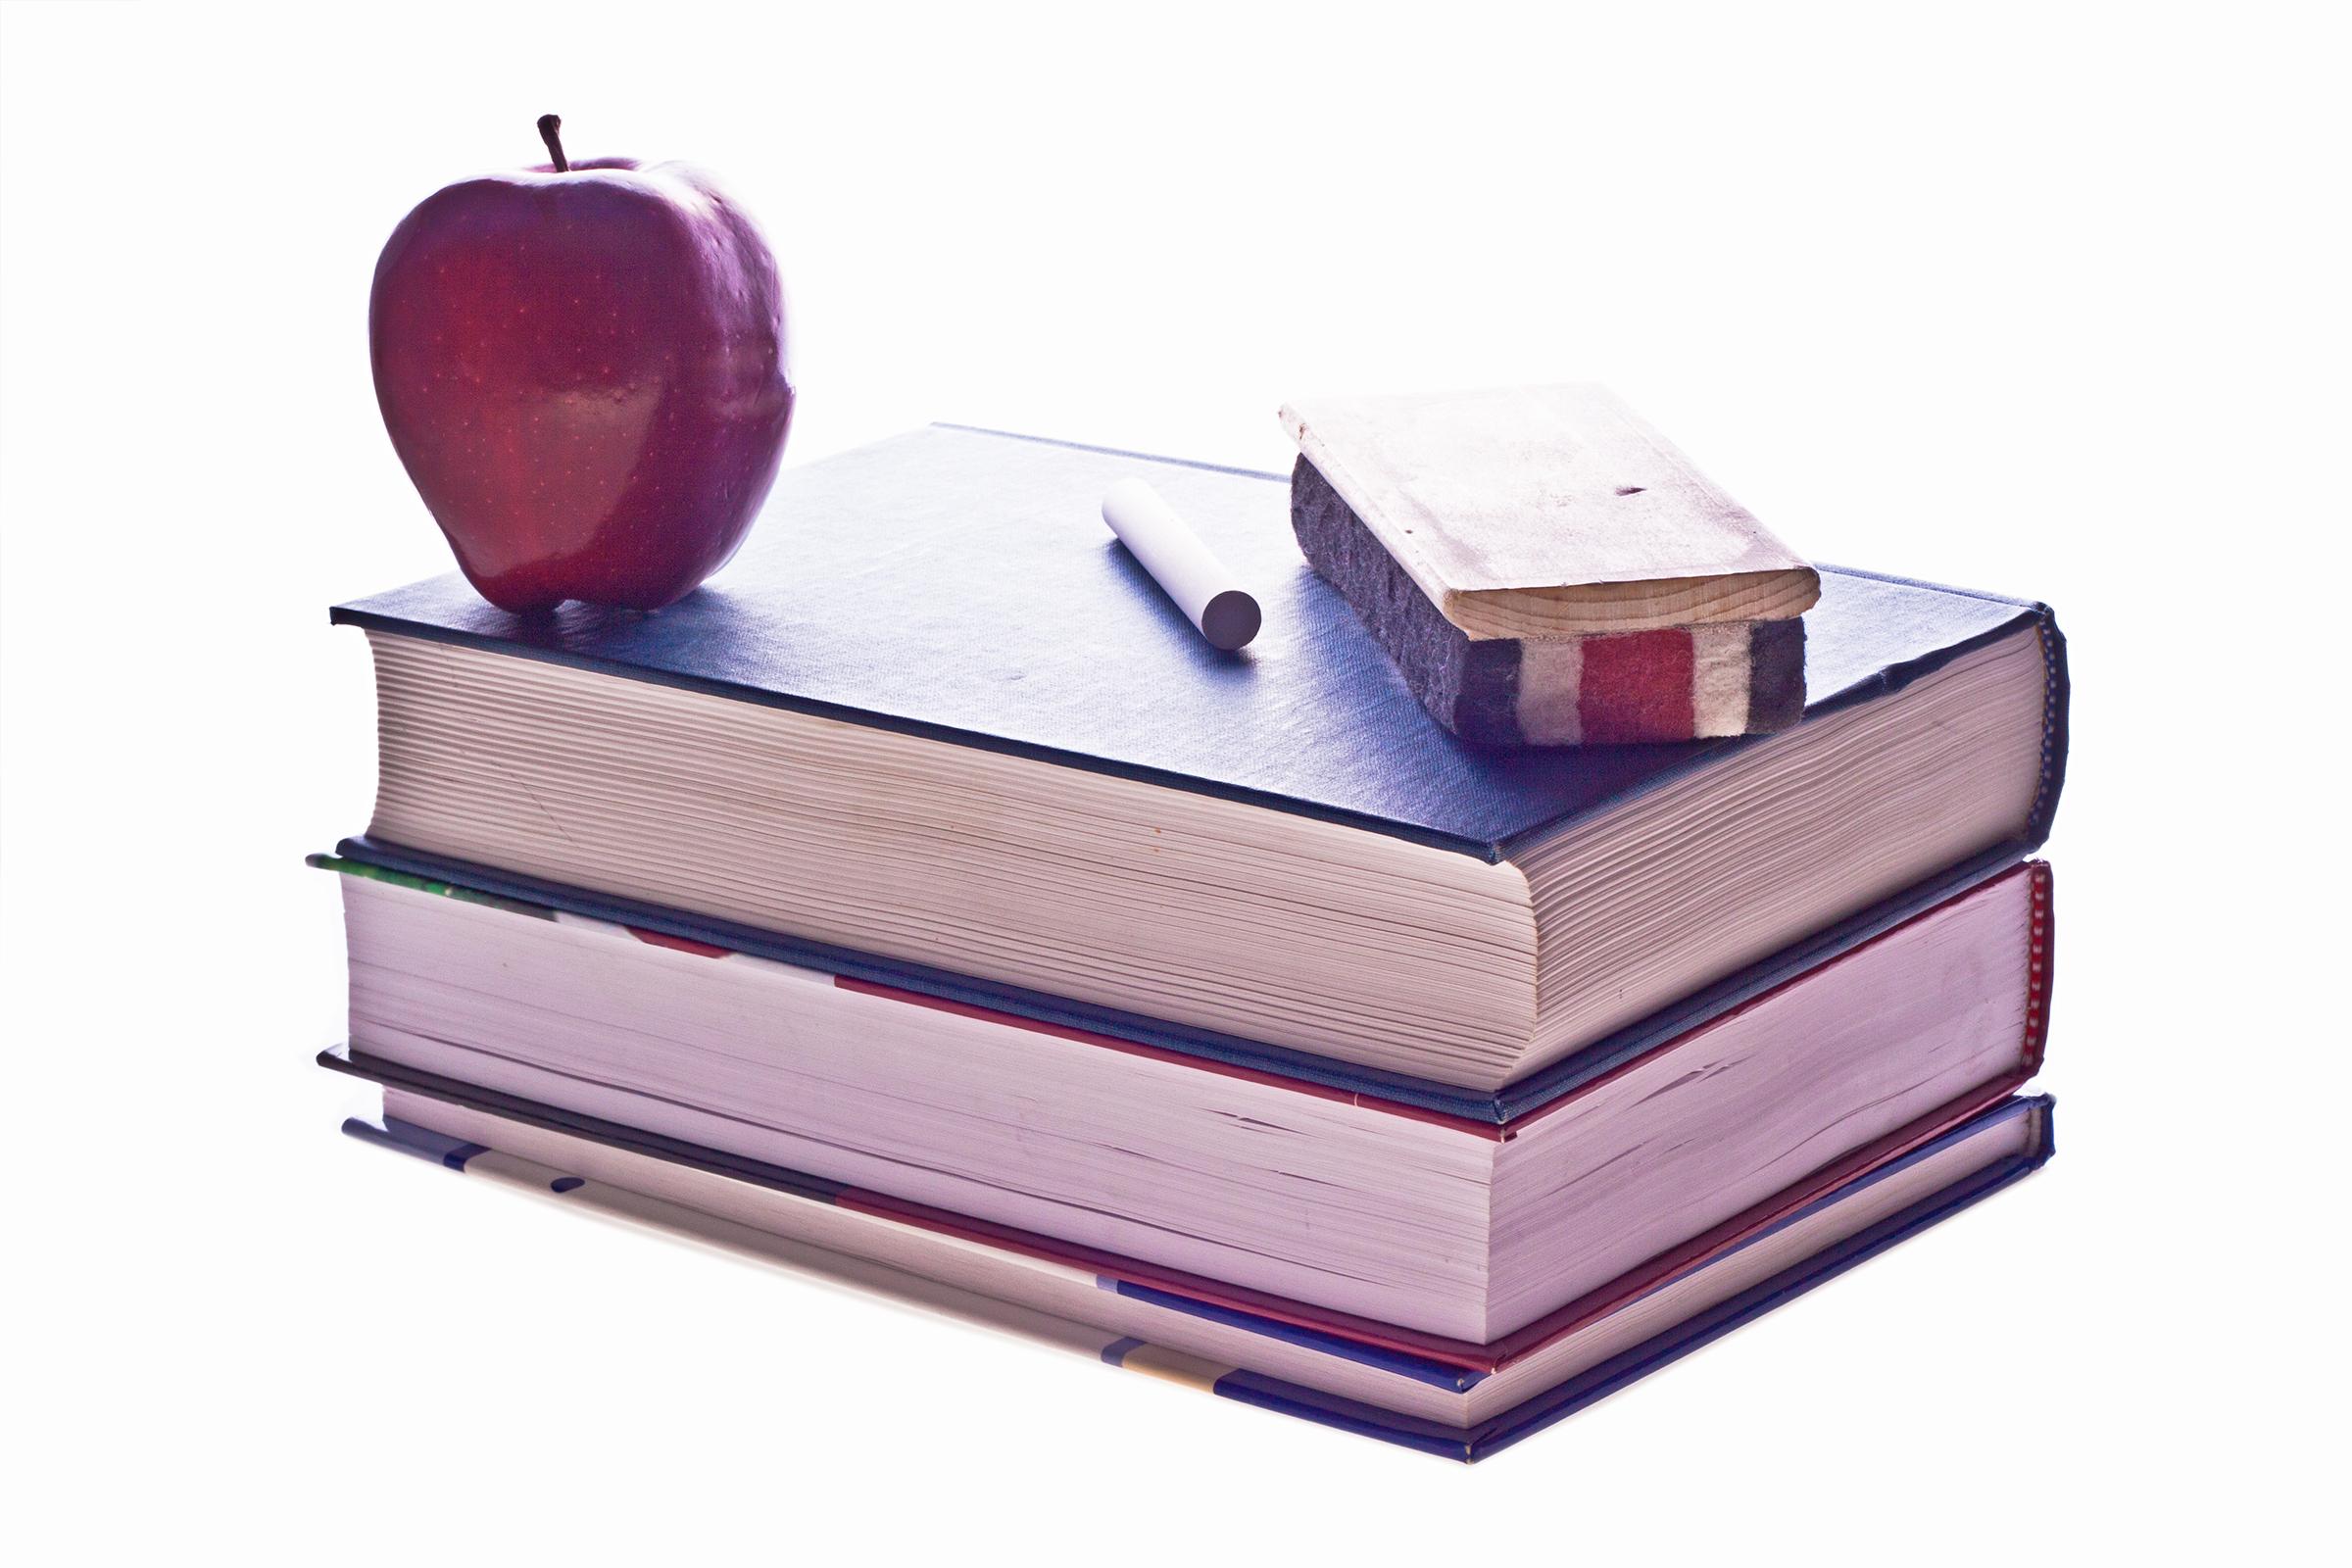 Education, Apple, Return, University, Tool, HQ Photo